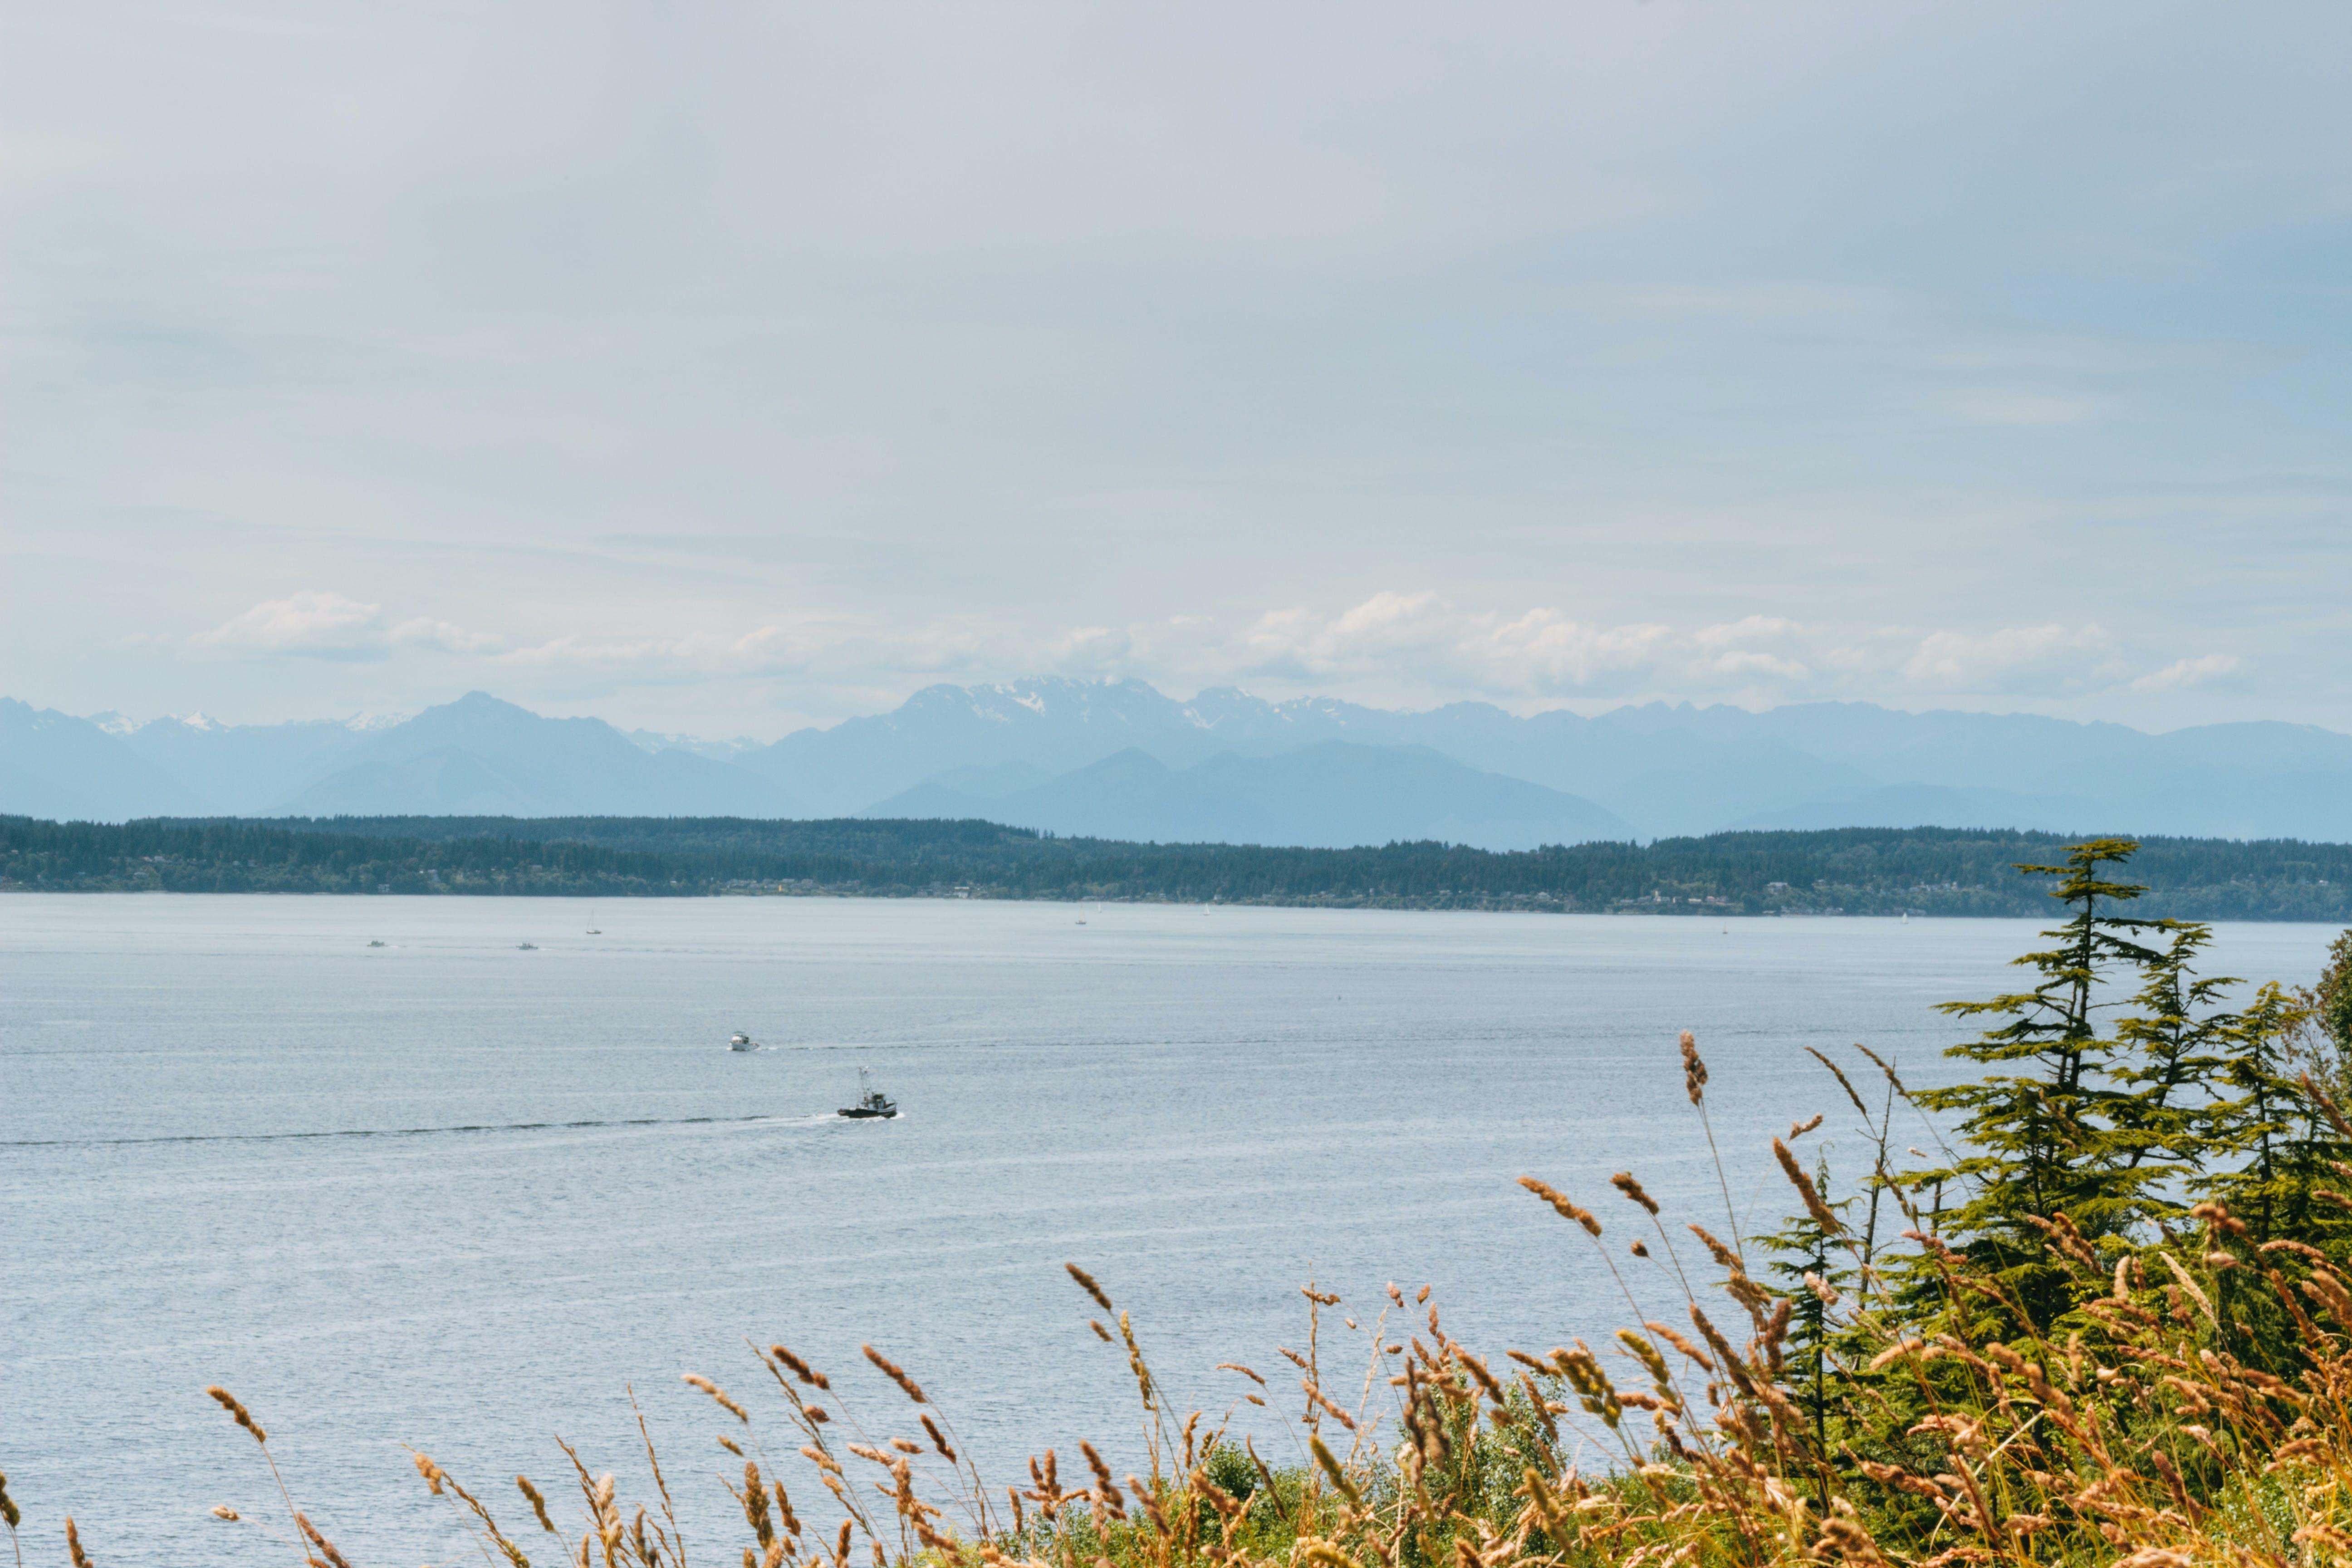 lake, mountains, nature